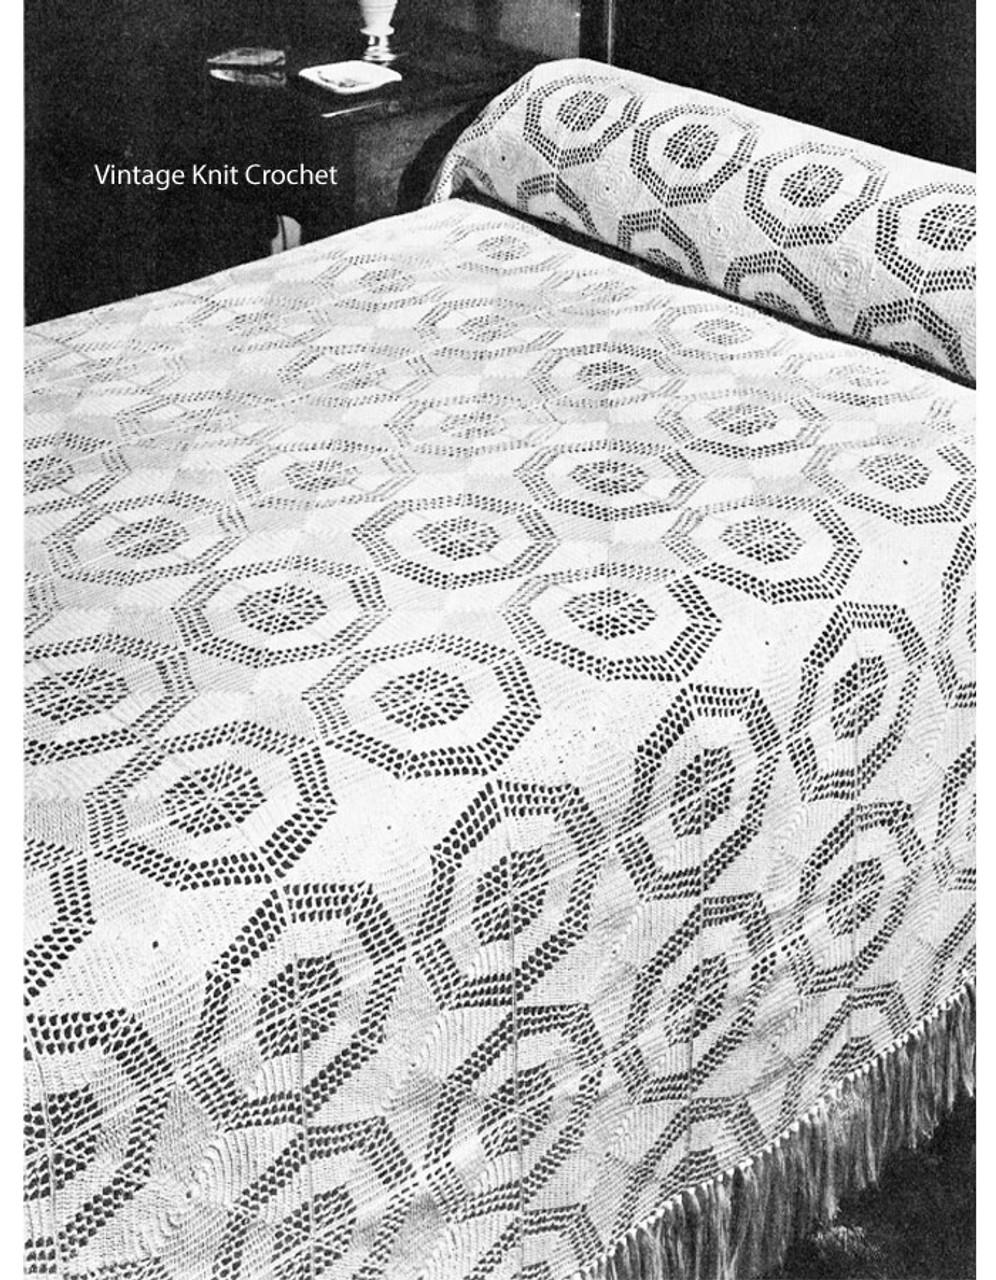 Vintage Octagon Crochet Bedspread Pattern